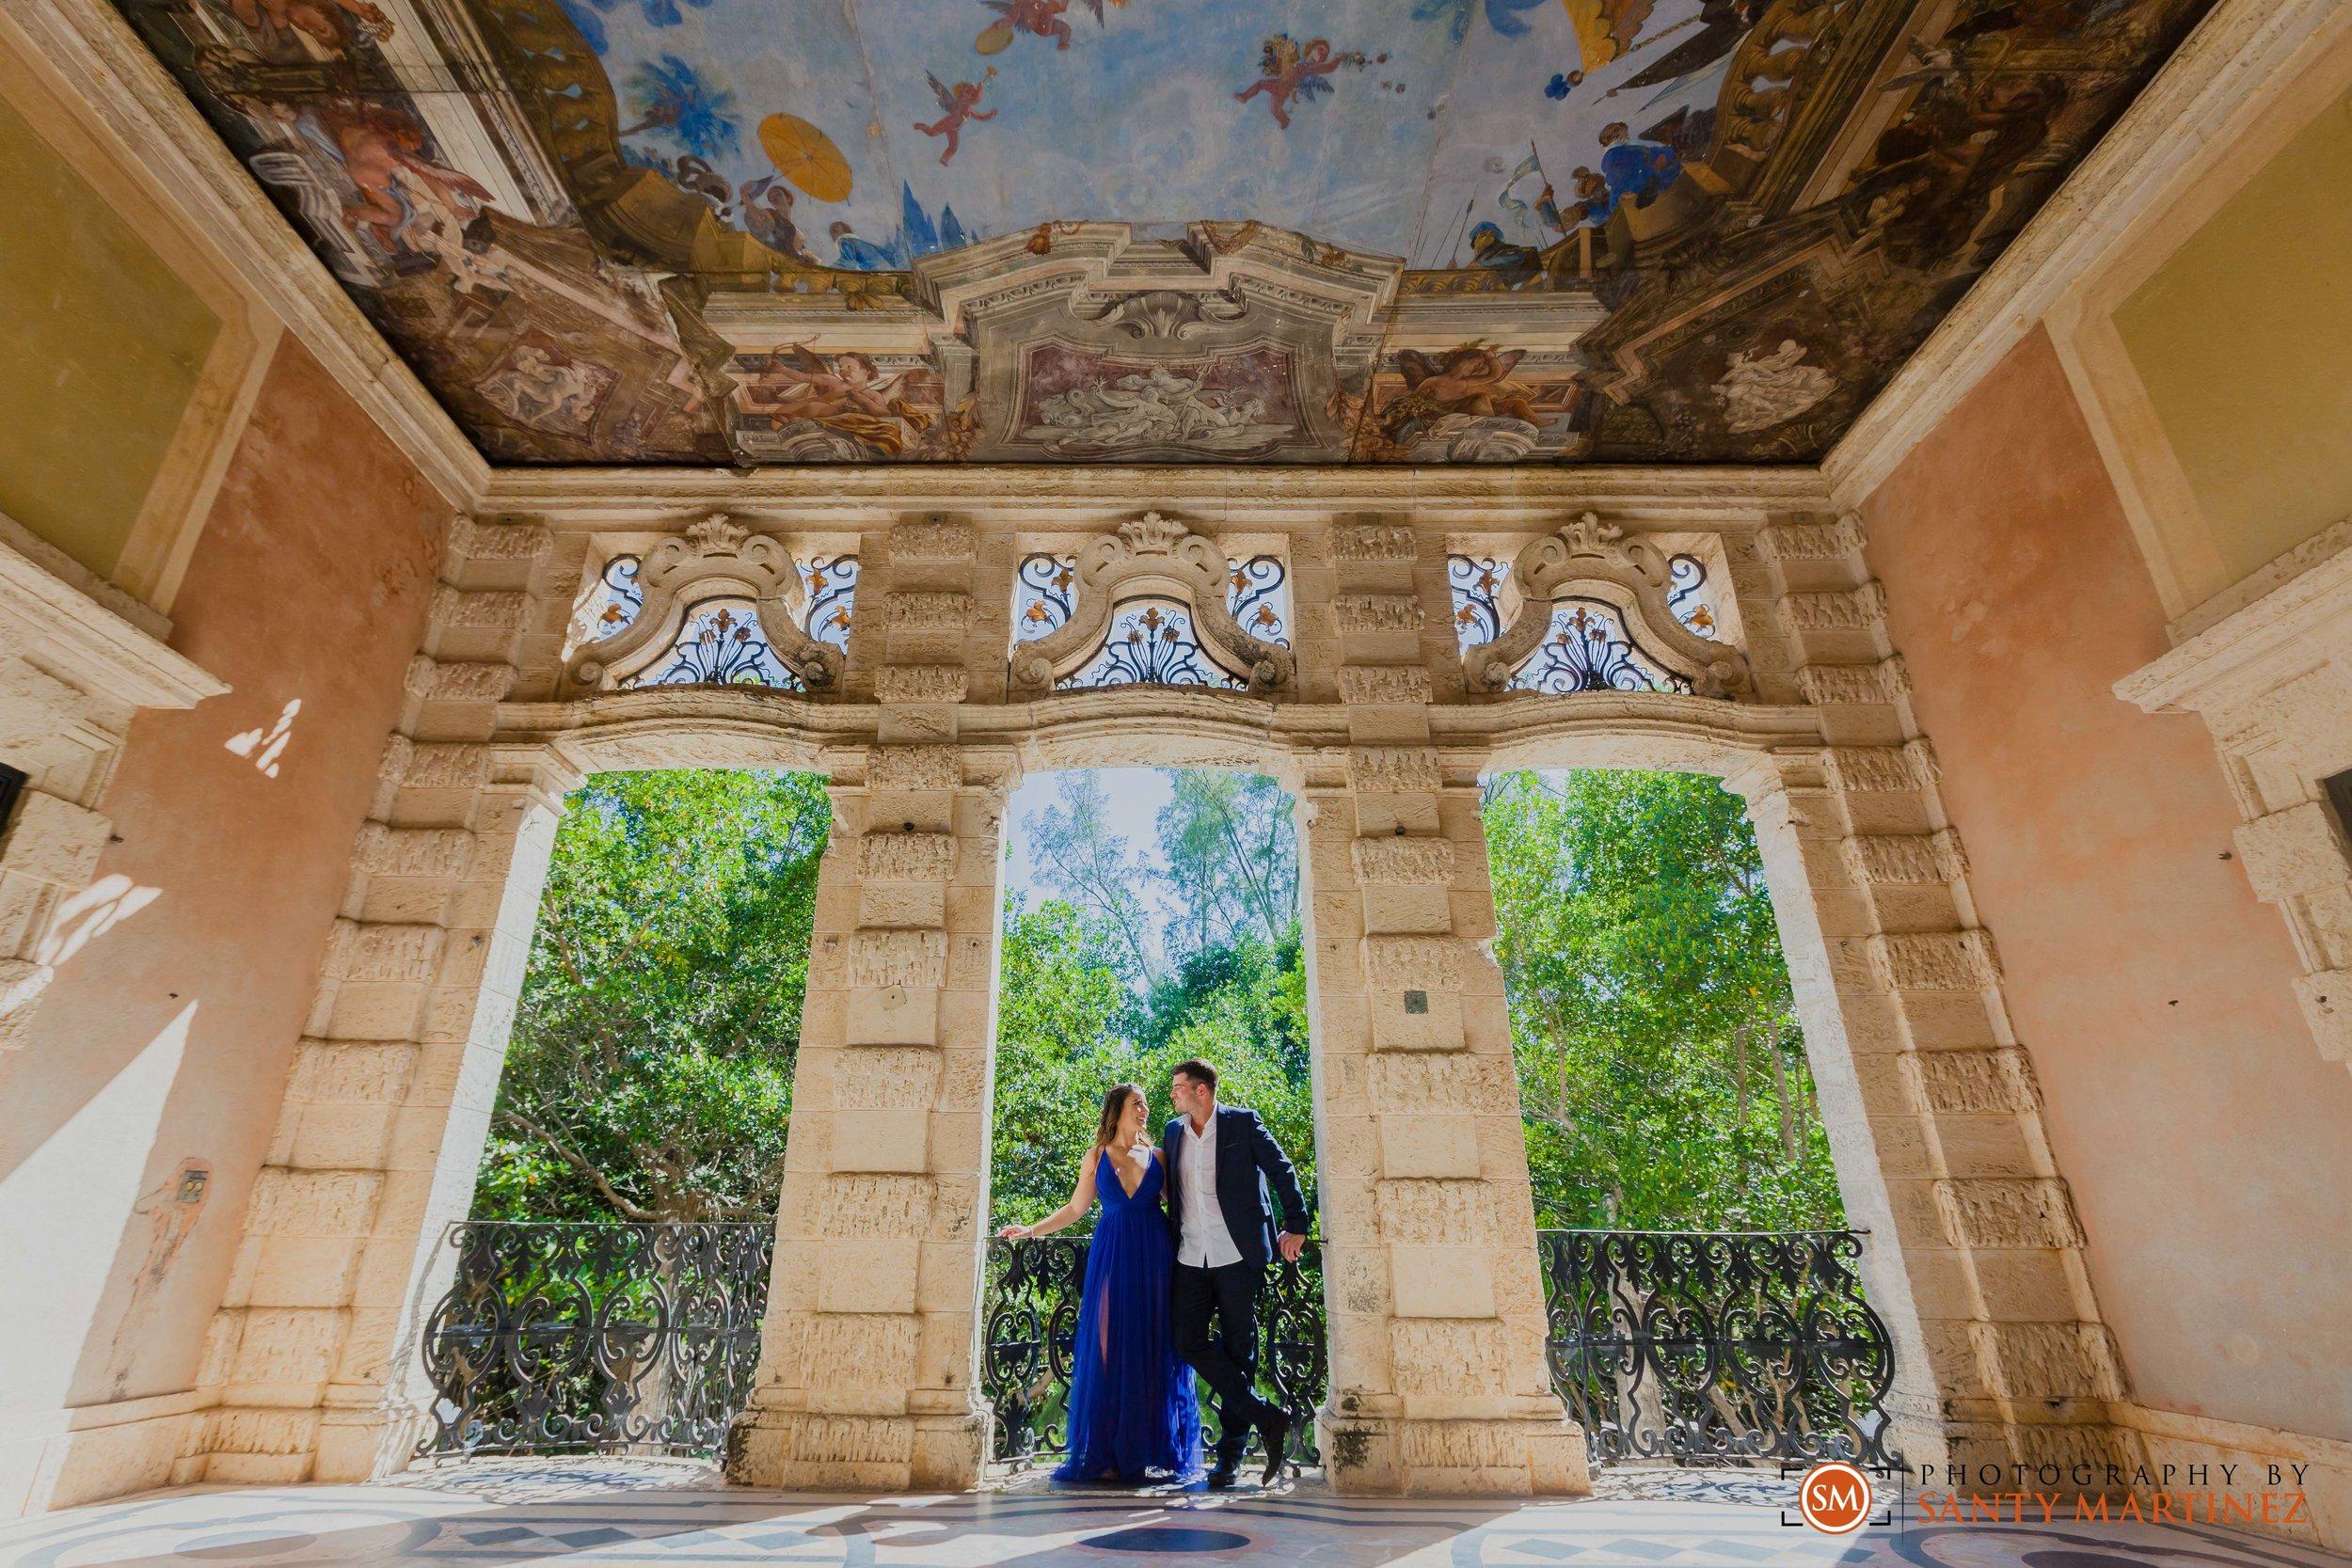 Engagement Session - Vizcaya - Photography by Santy Martinez-7.jpg